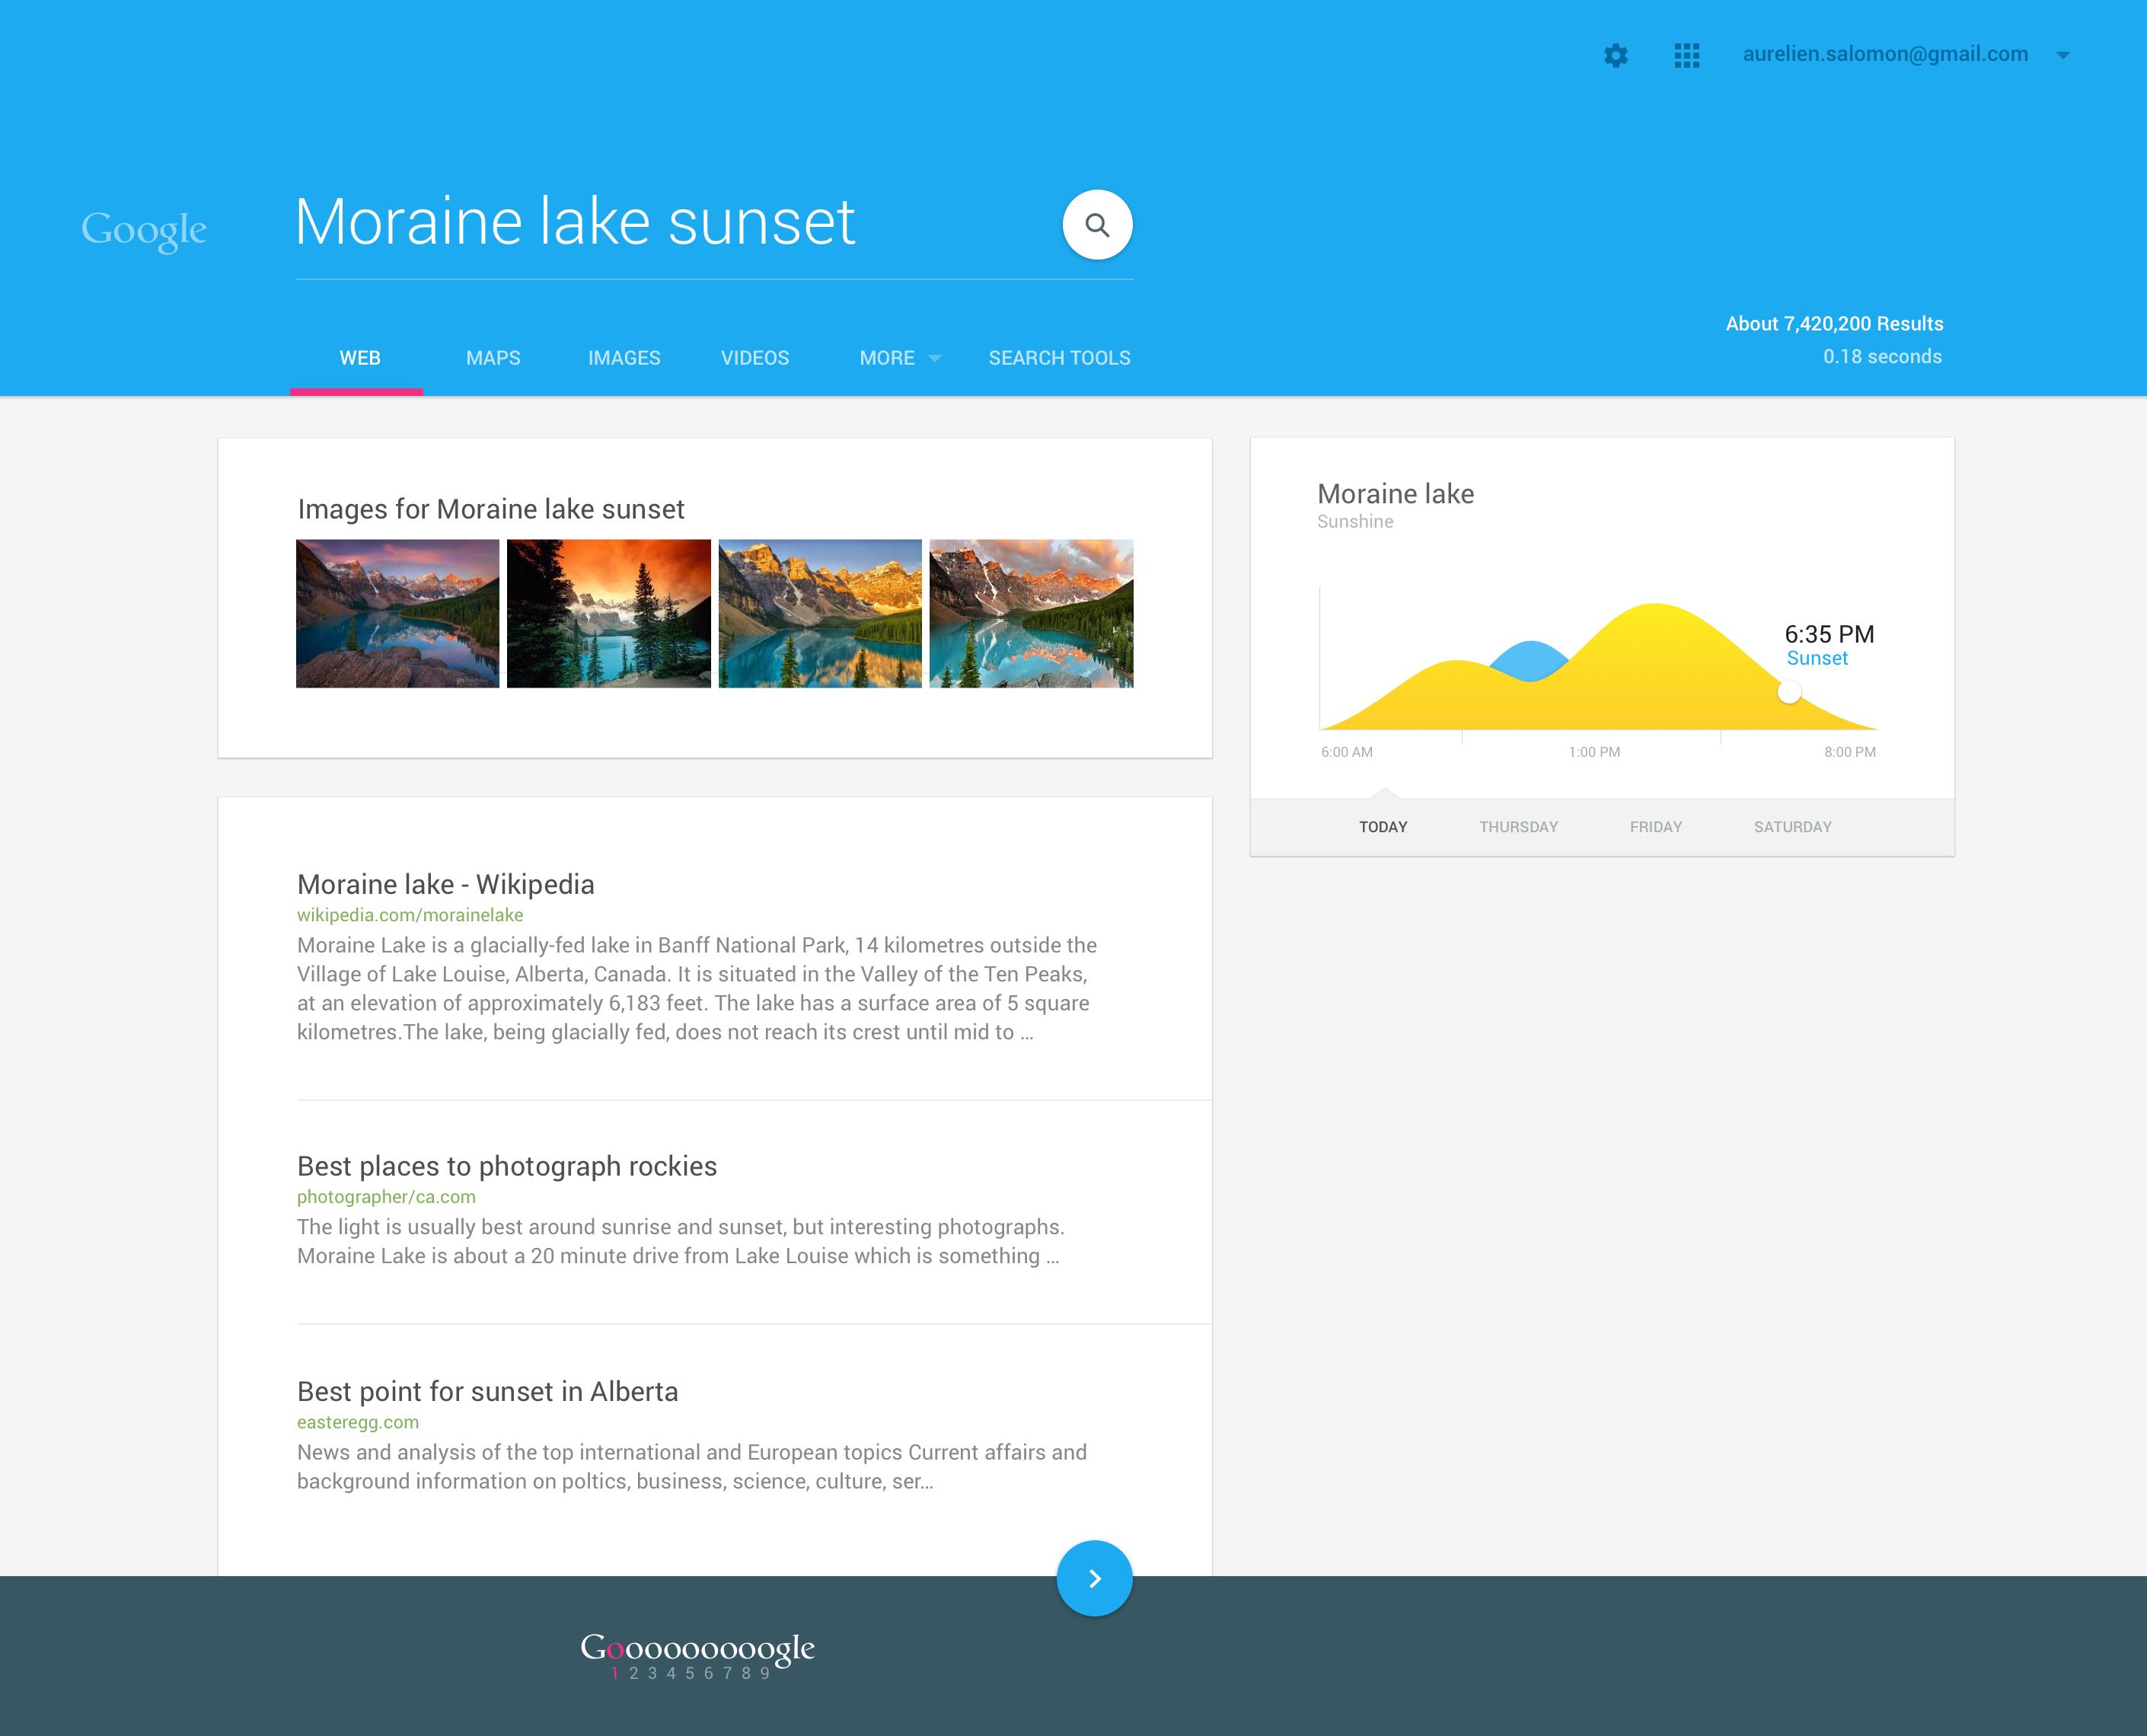 Google - Material exploration | Design: Picked-up UI